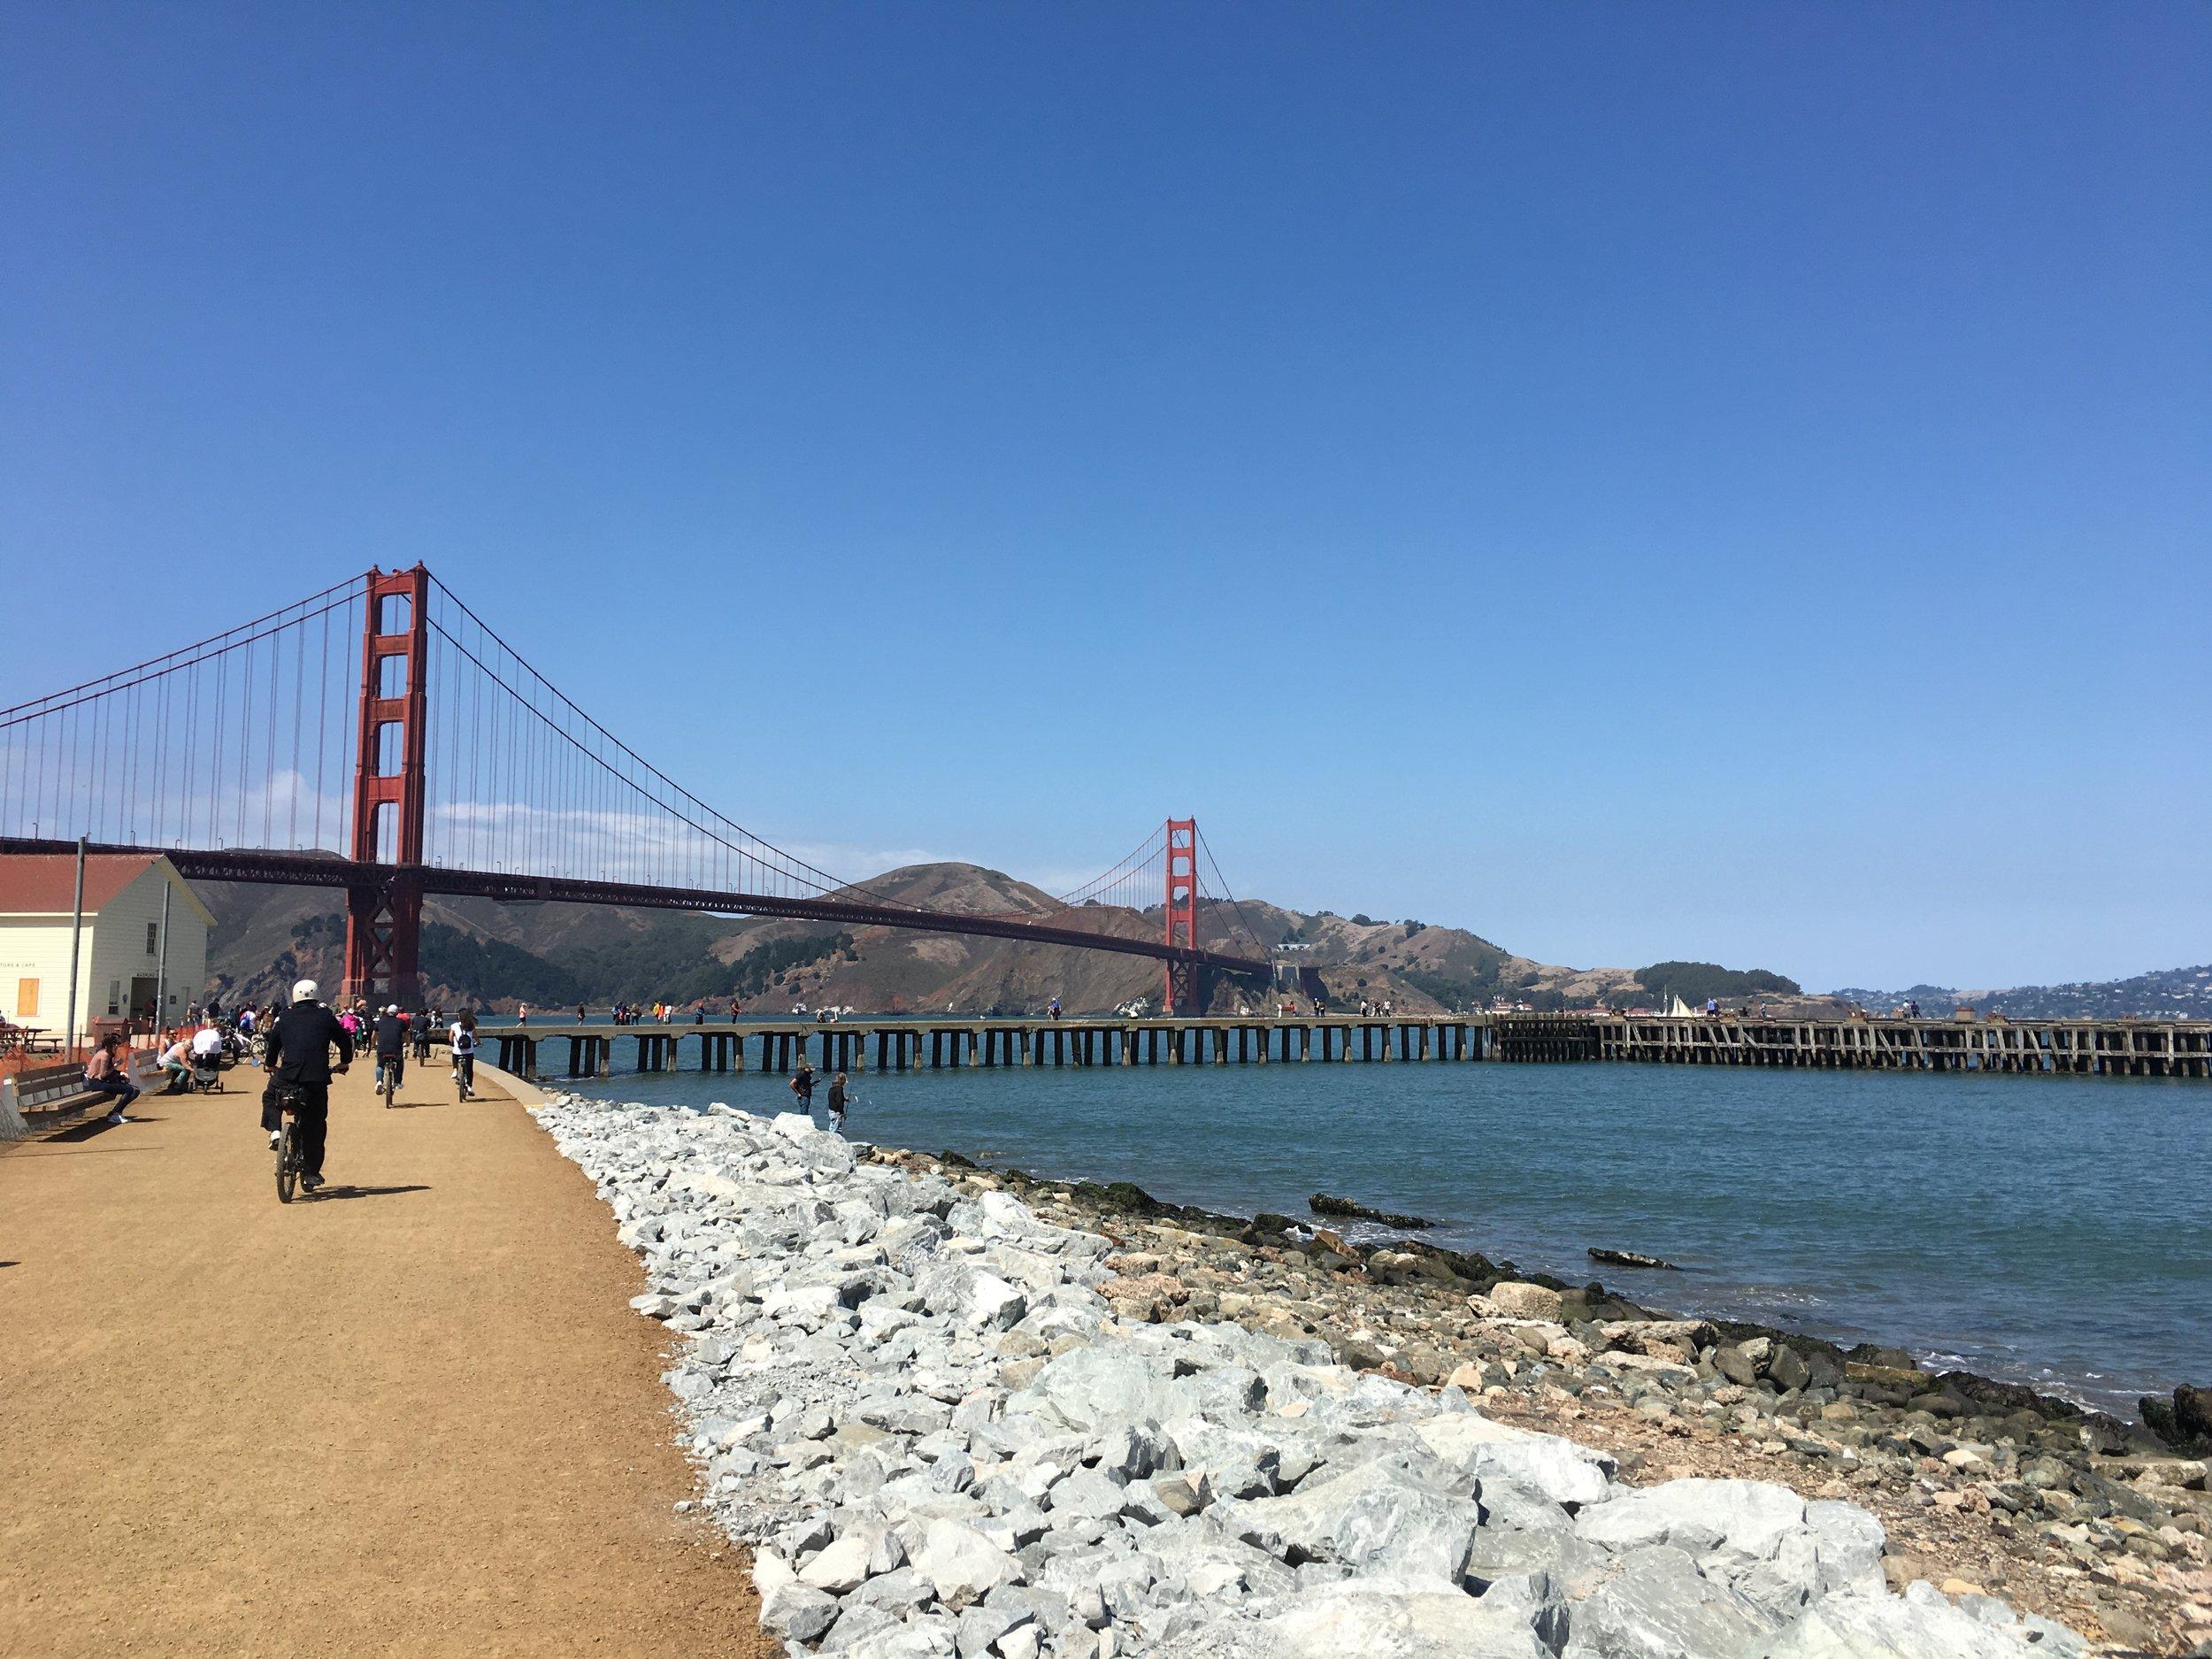 The bike path to the Golden Gate Bridge